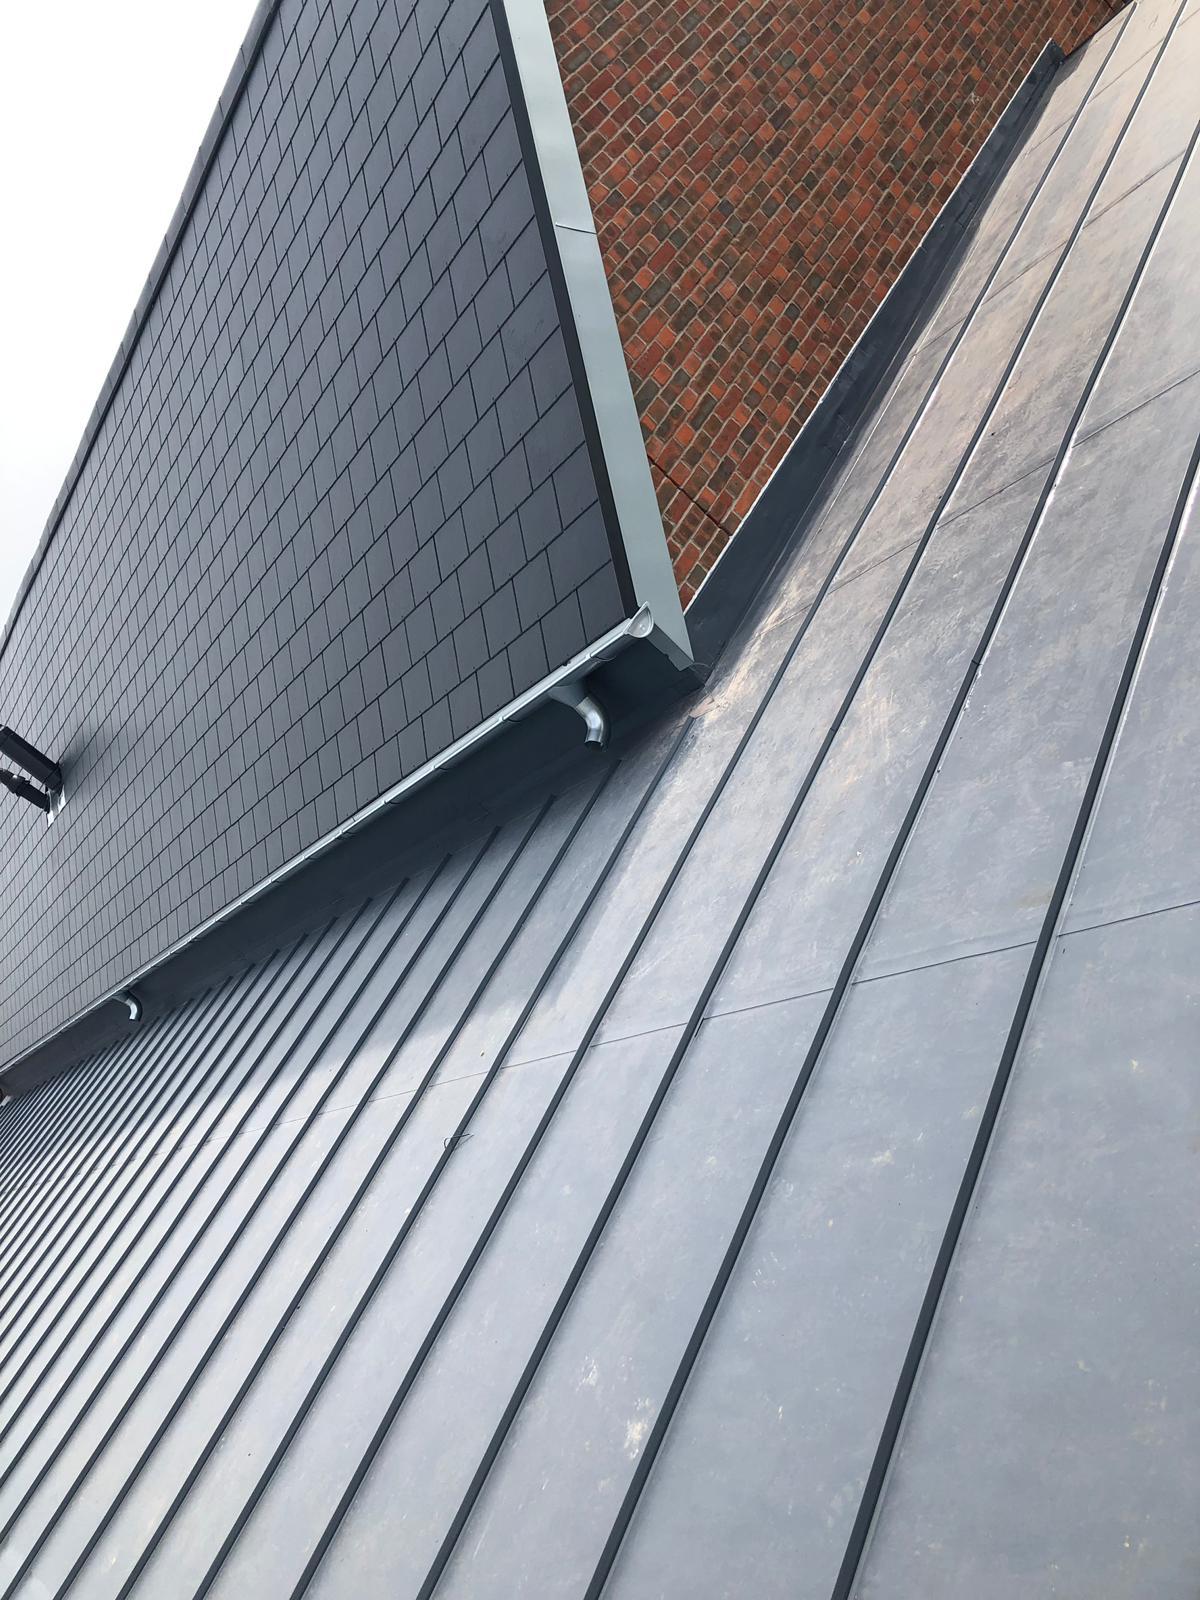 Royal Wotton Basset School Frc Roofing